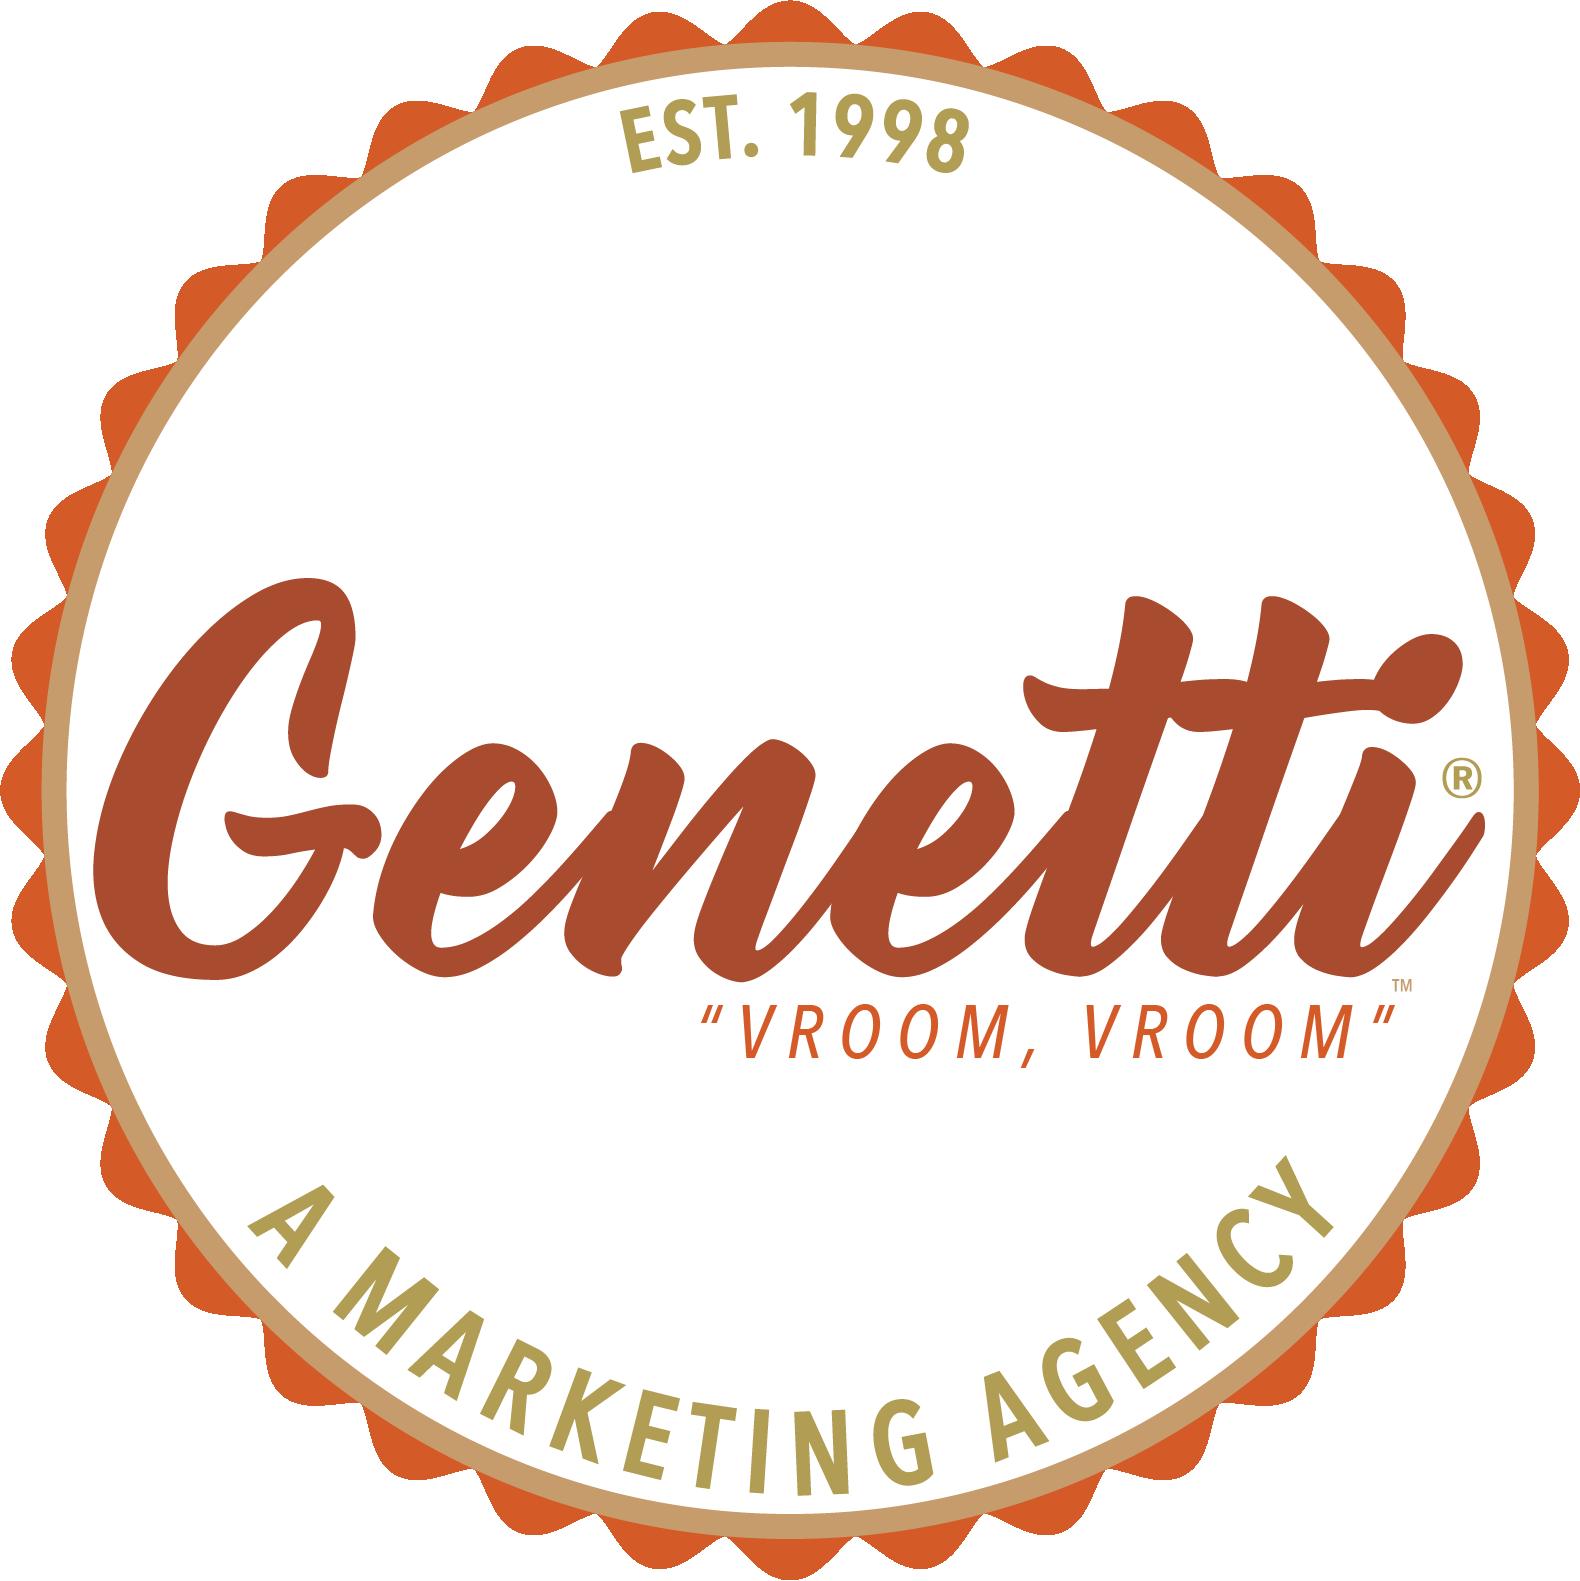 Genetti Design and Print